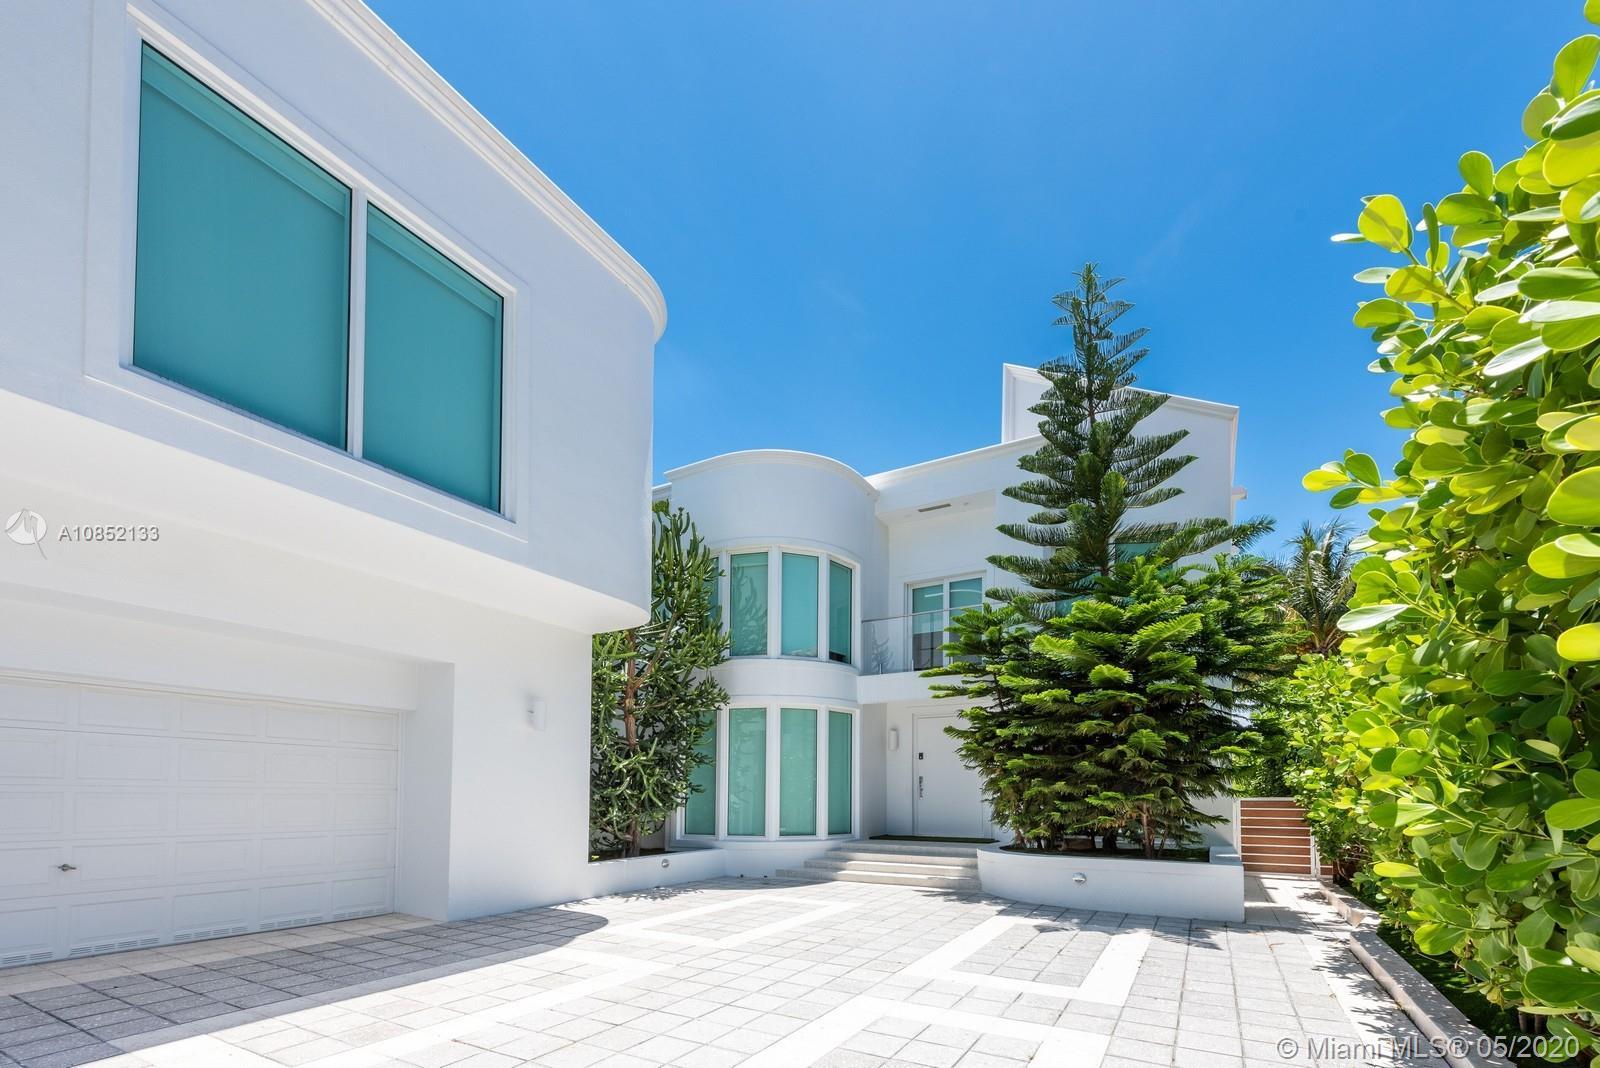 Real Estate Photo A10852133